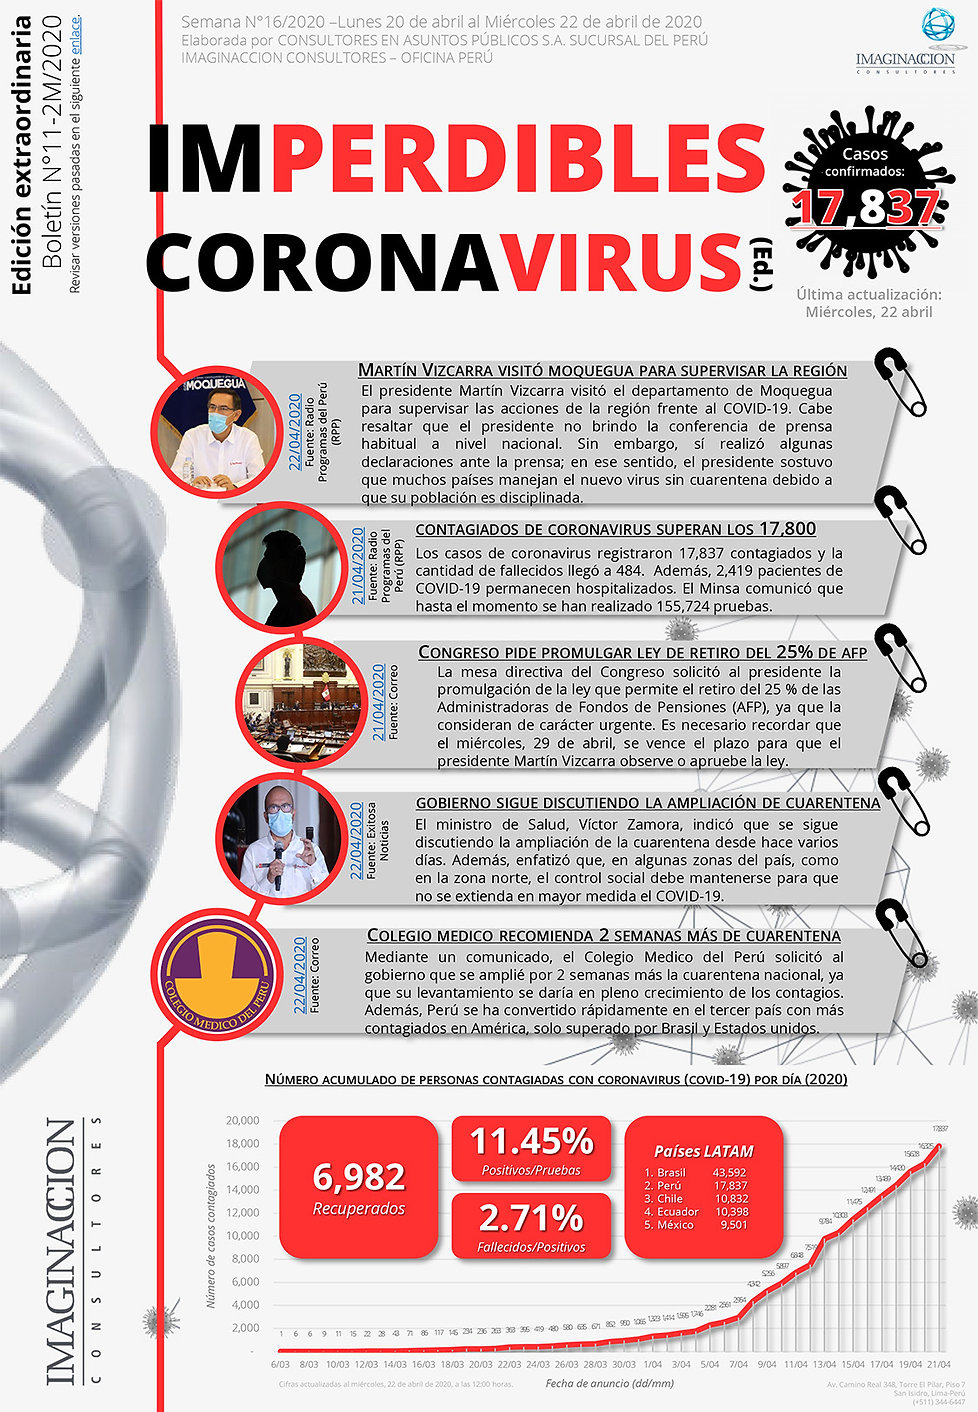 011-02M-2020_-_BOLETÍN_CORONAVIRUS_N°